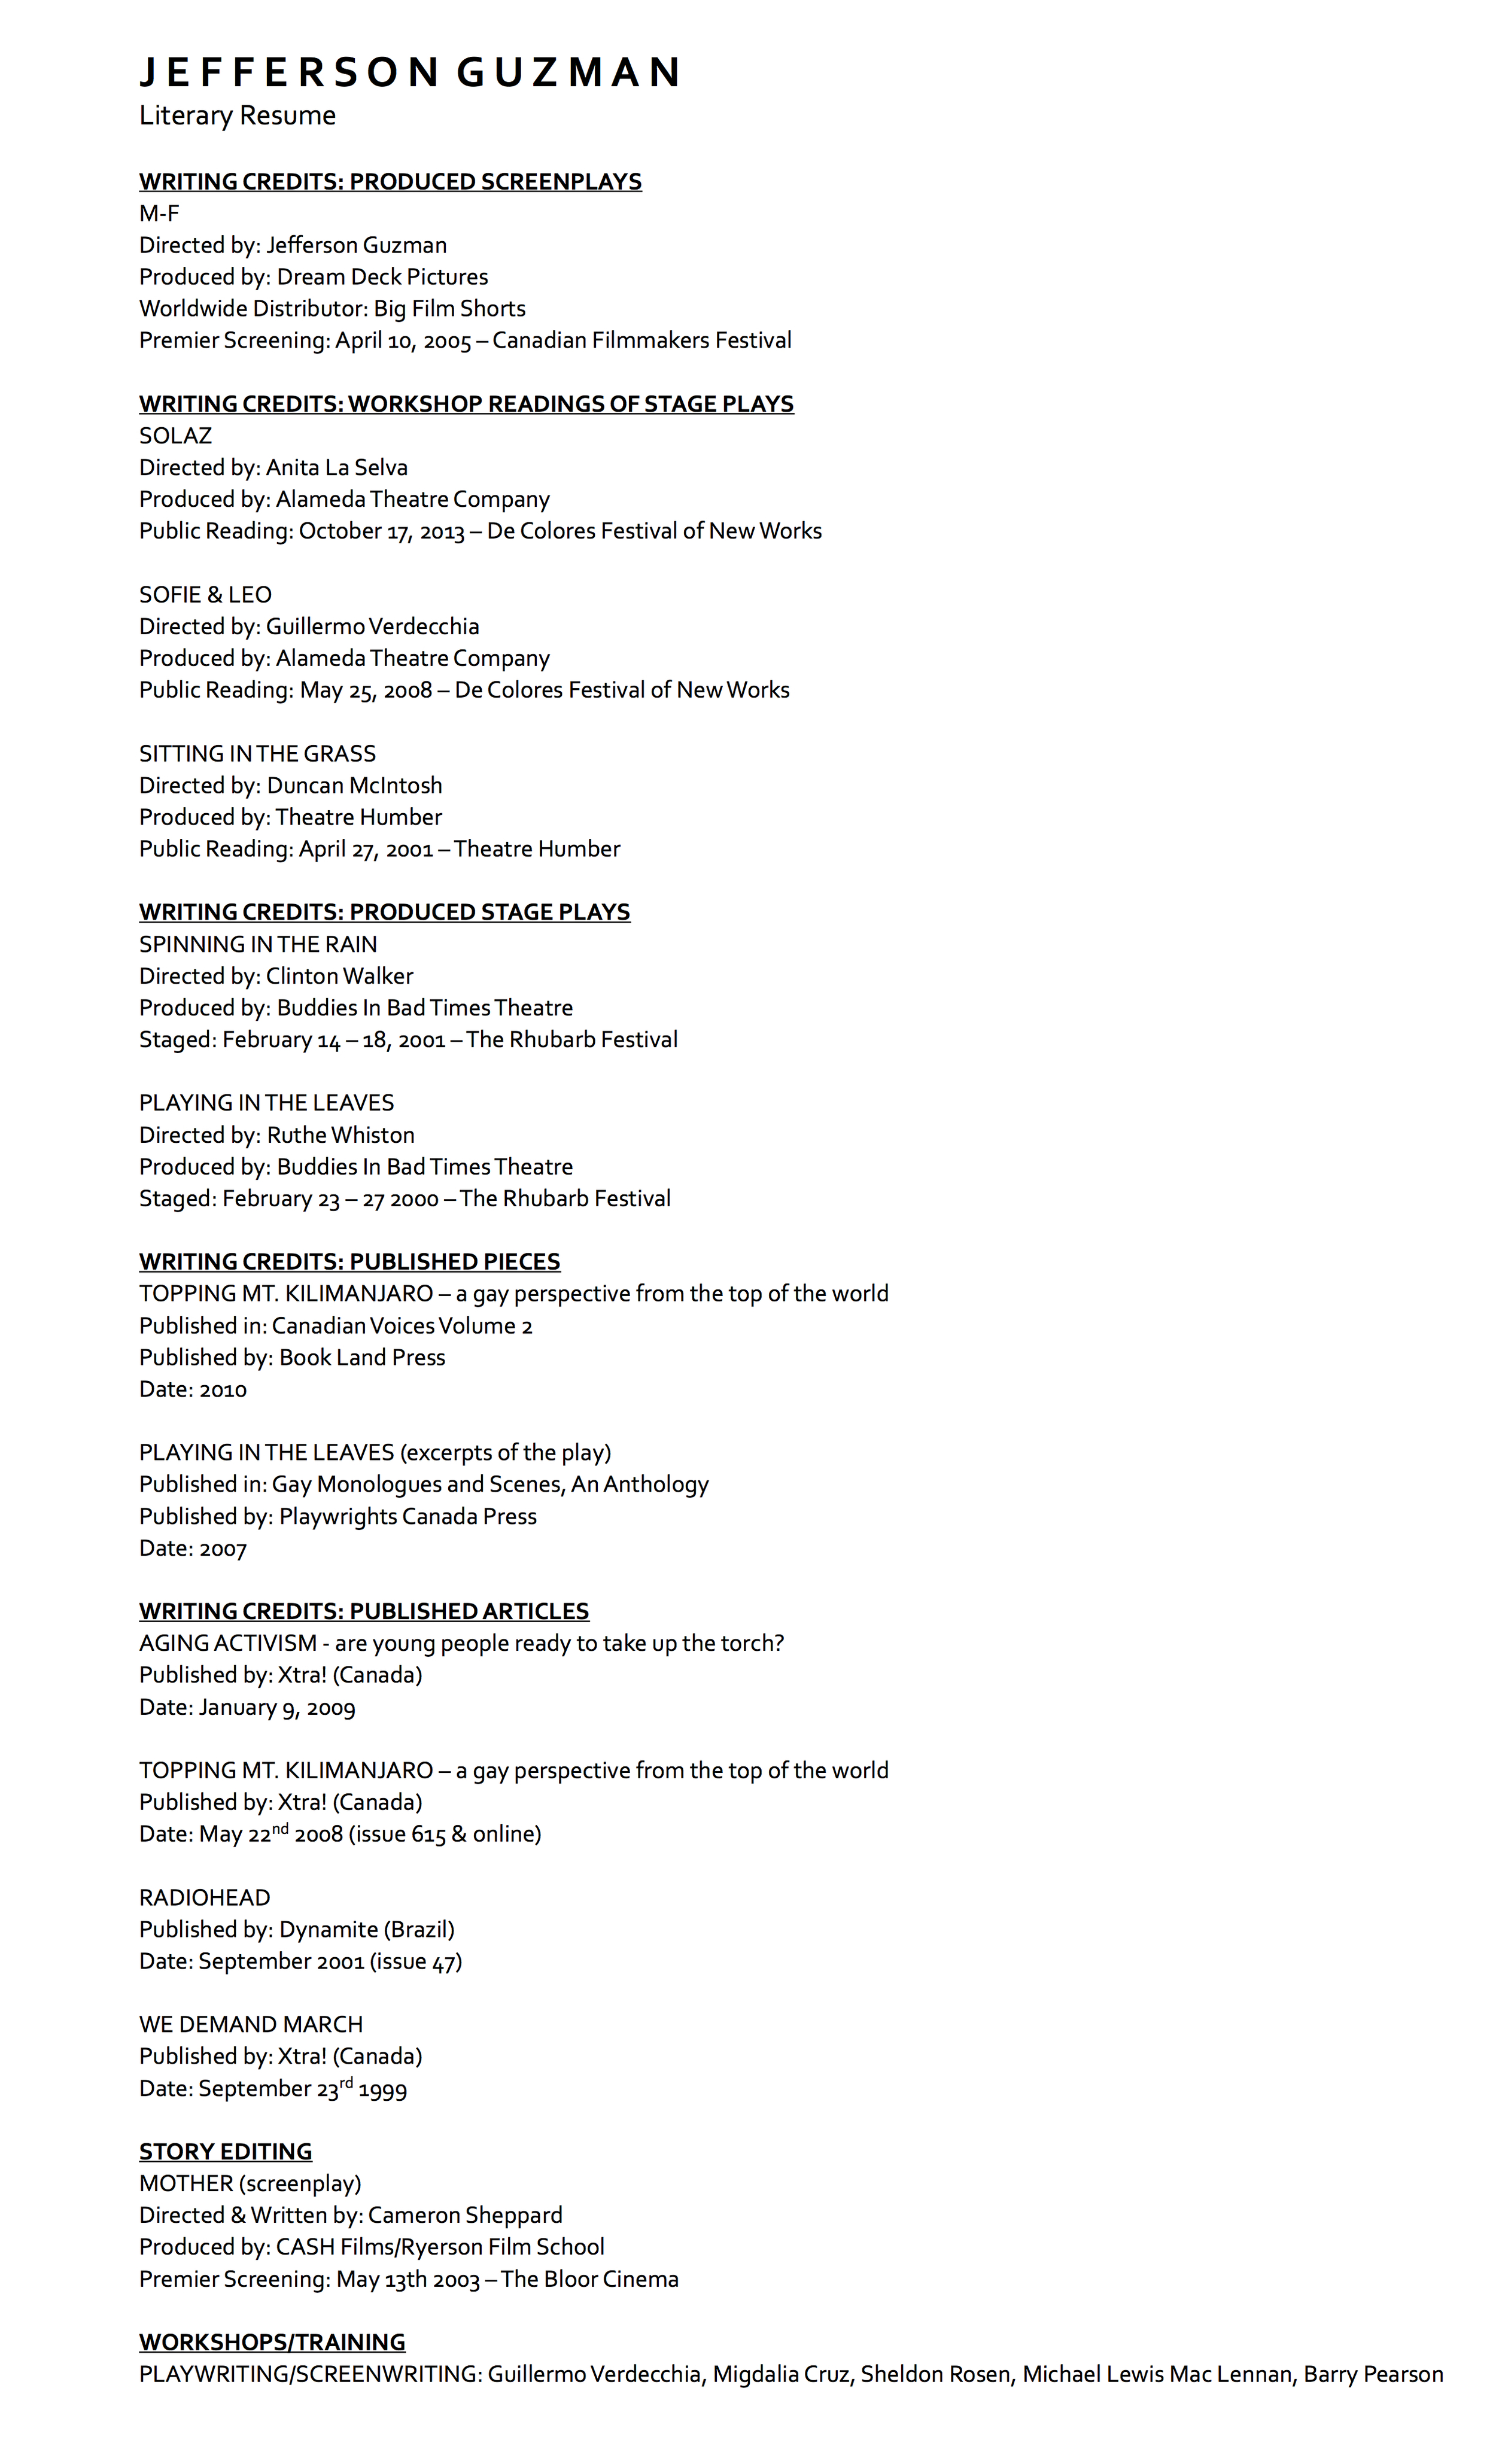 Literary Resume Nov 2013.jpg